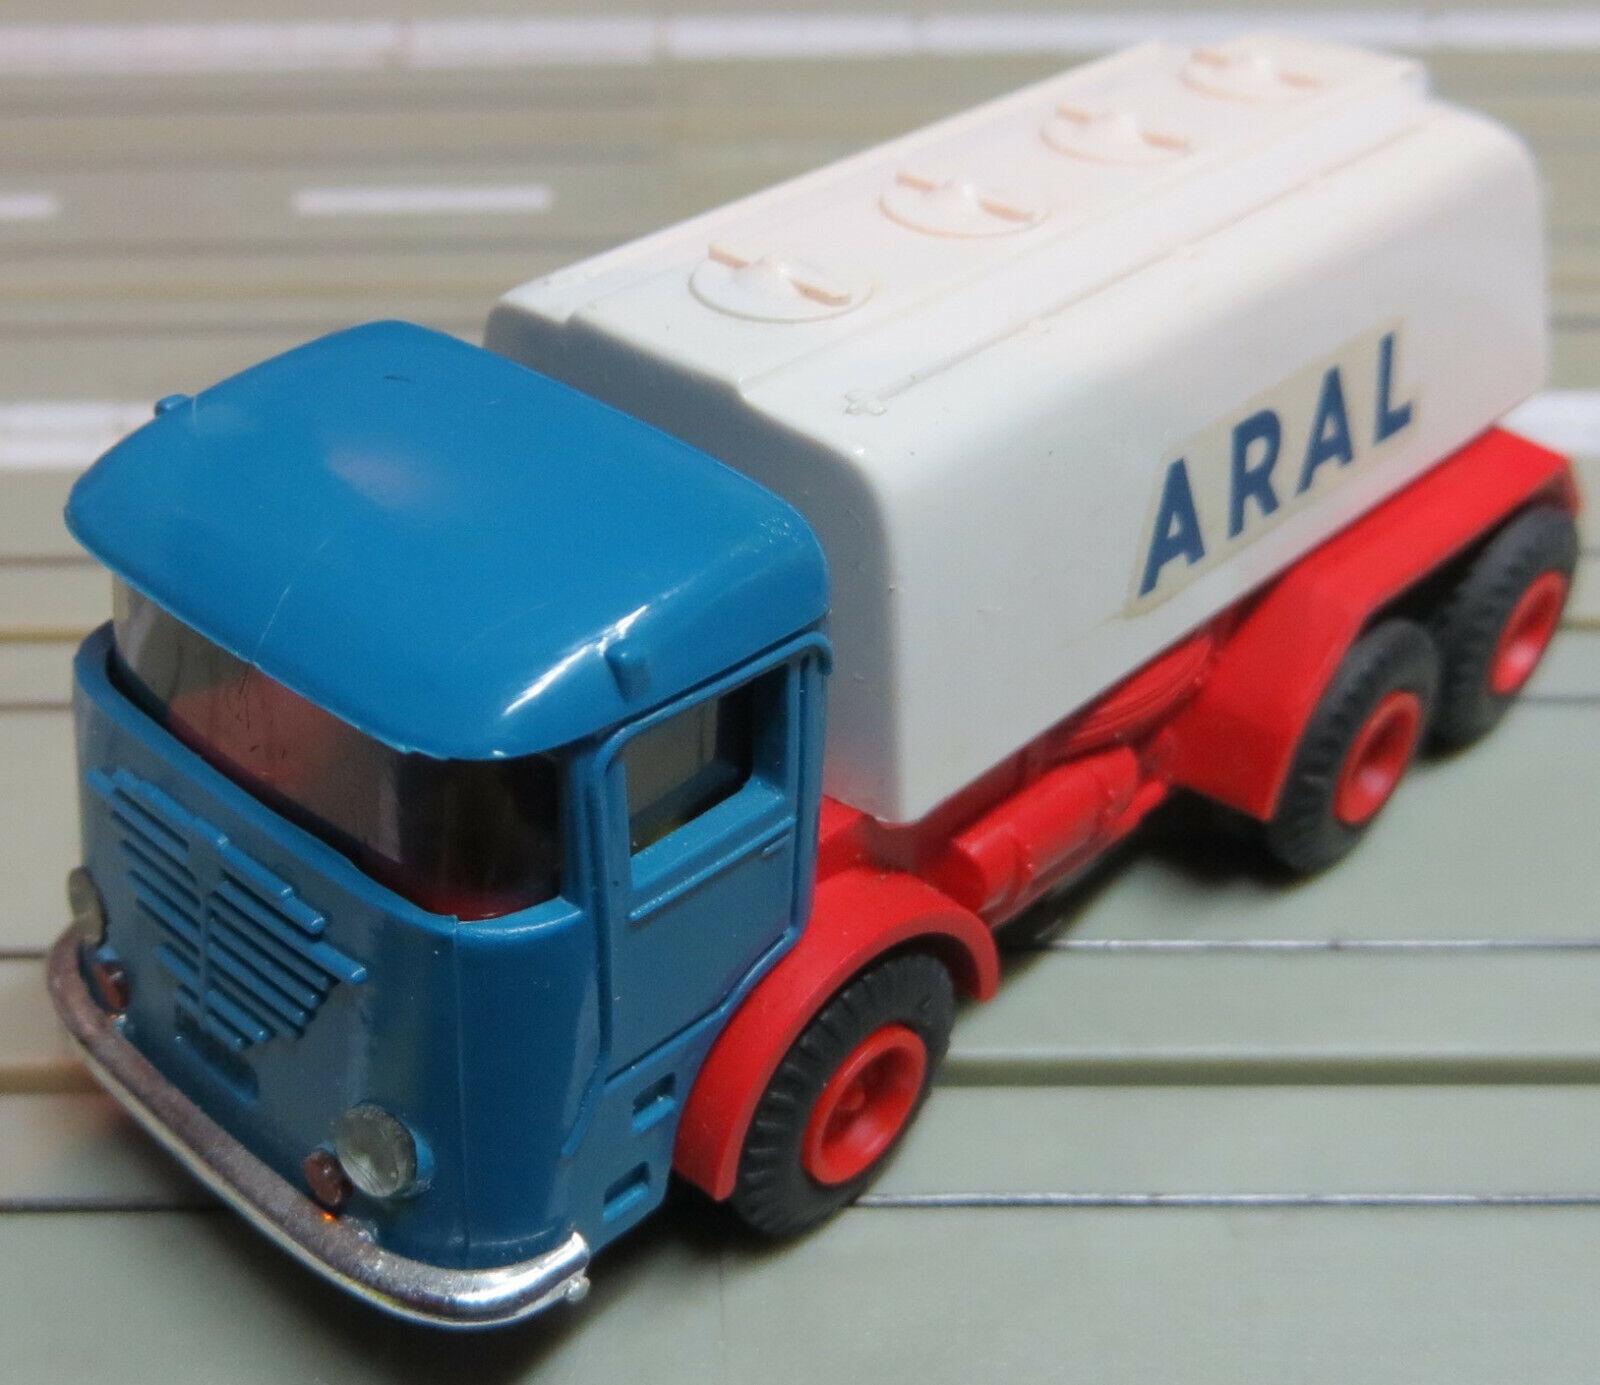 Faller A.M. S . Aral Camiones Cisternas Con